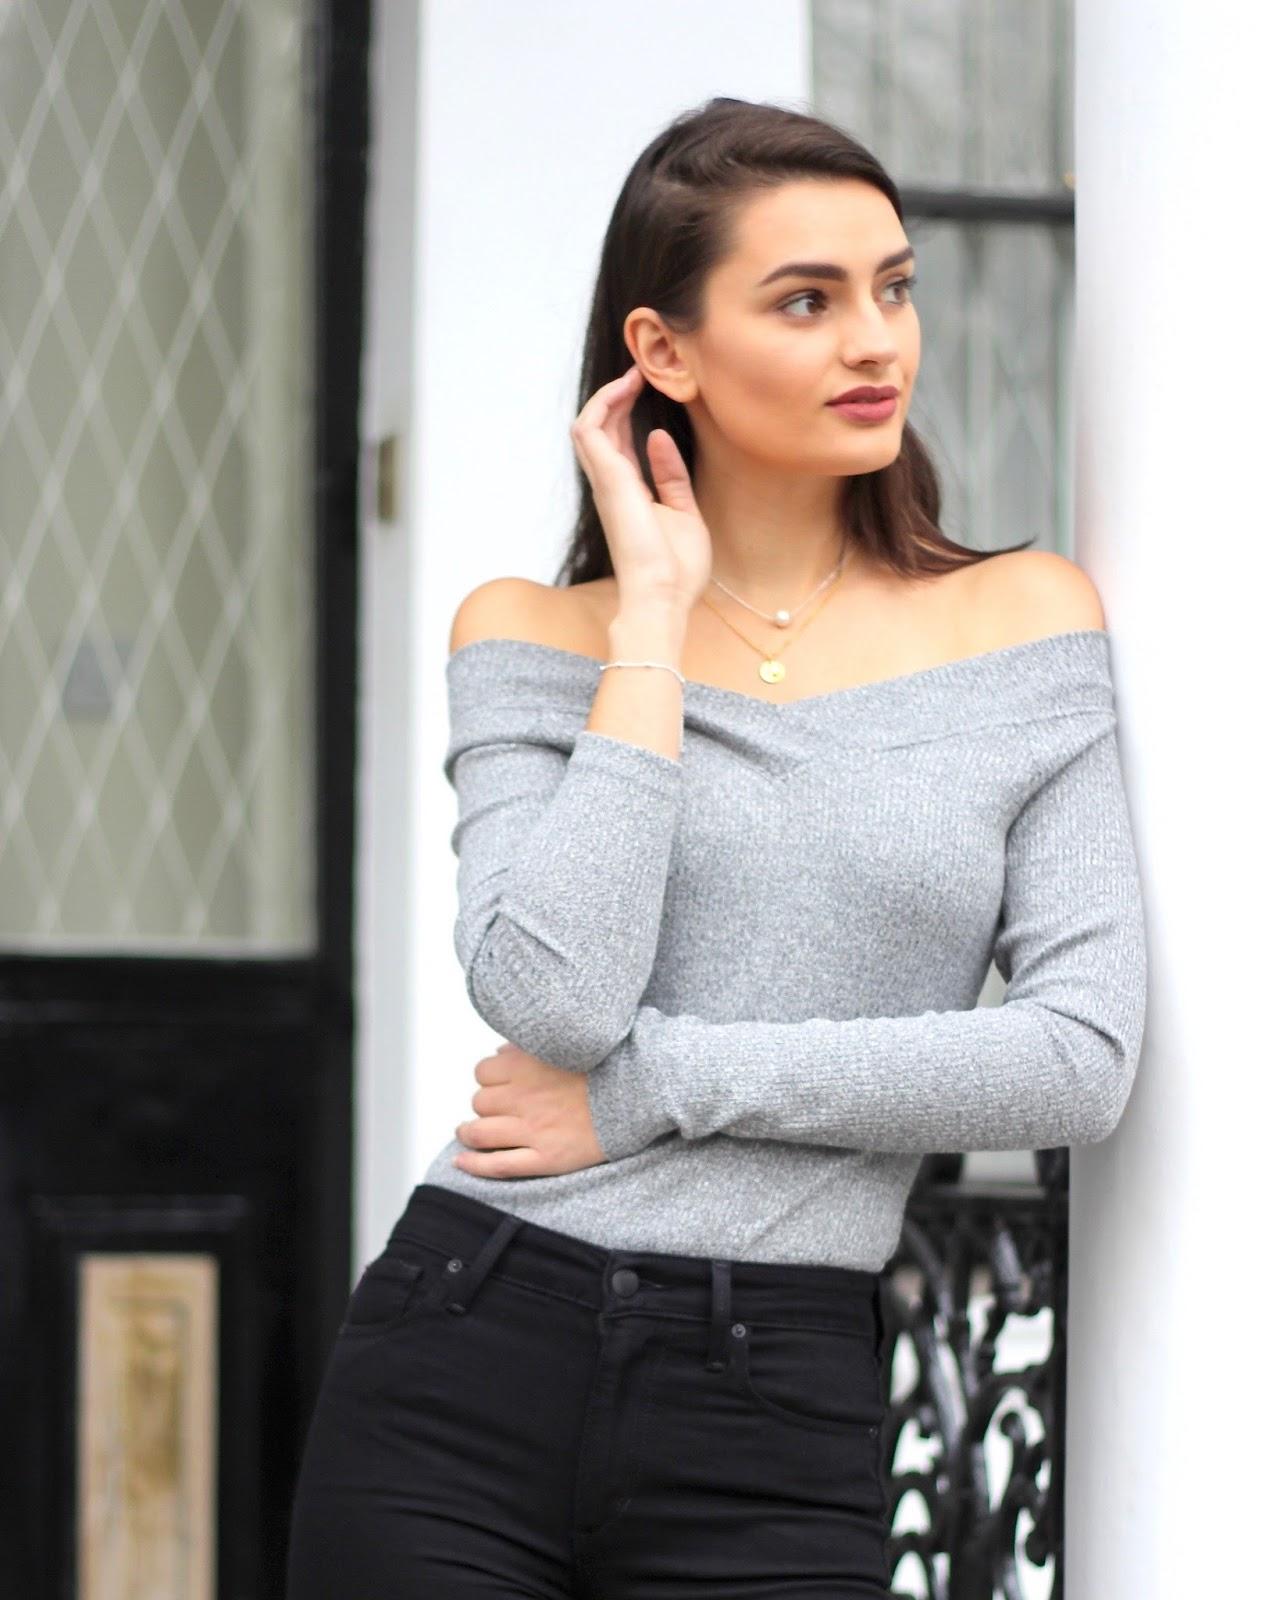 peexo style blogger thomas sabo jewellery